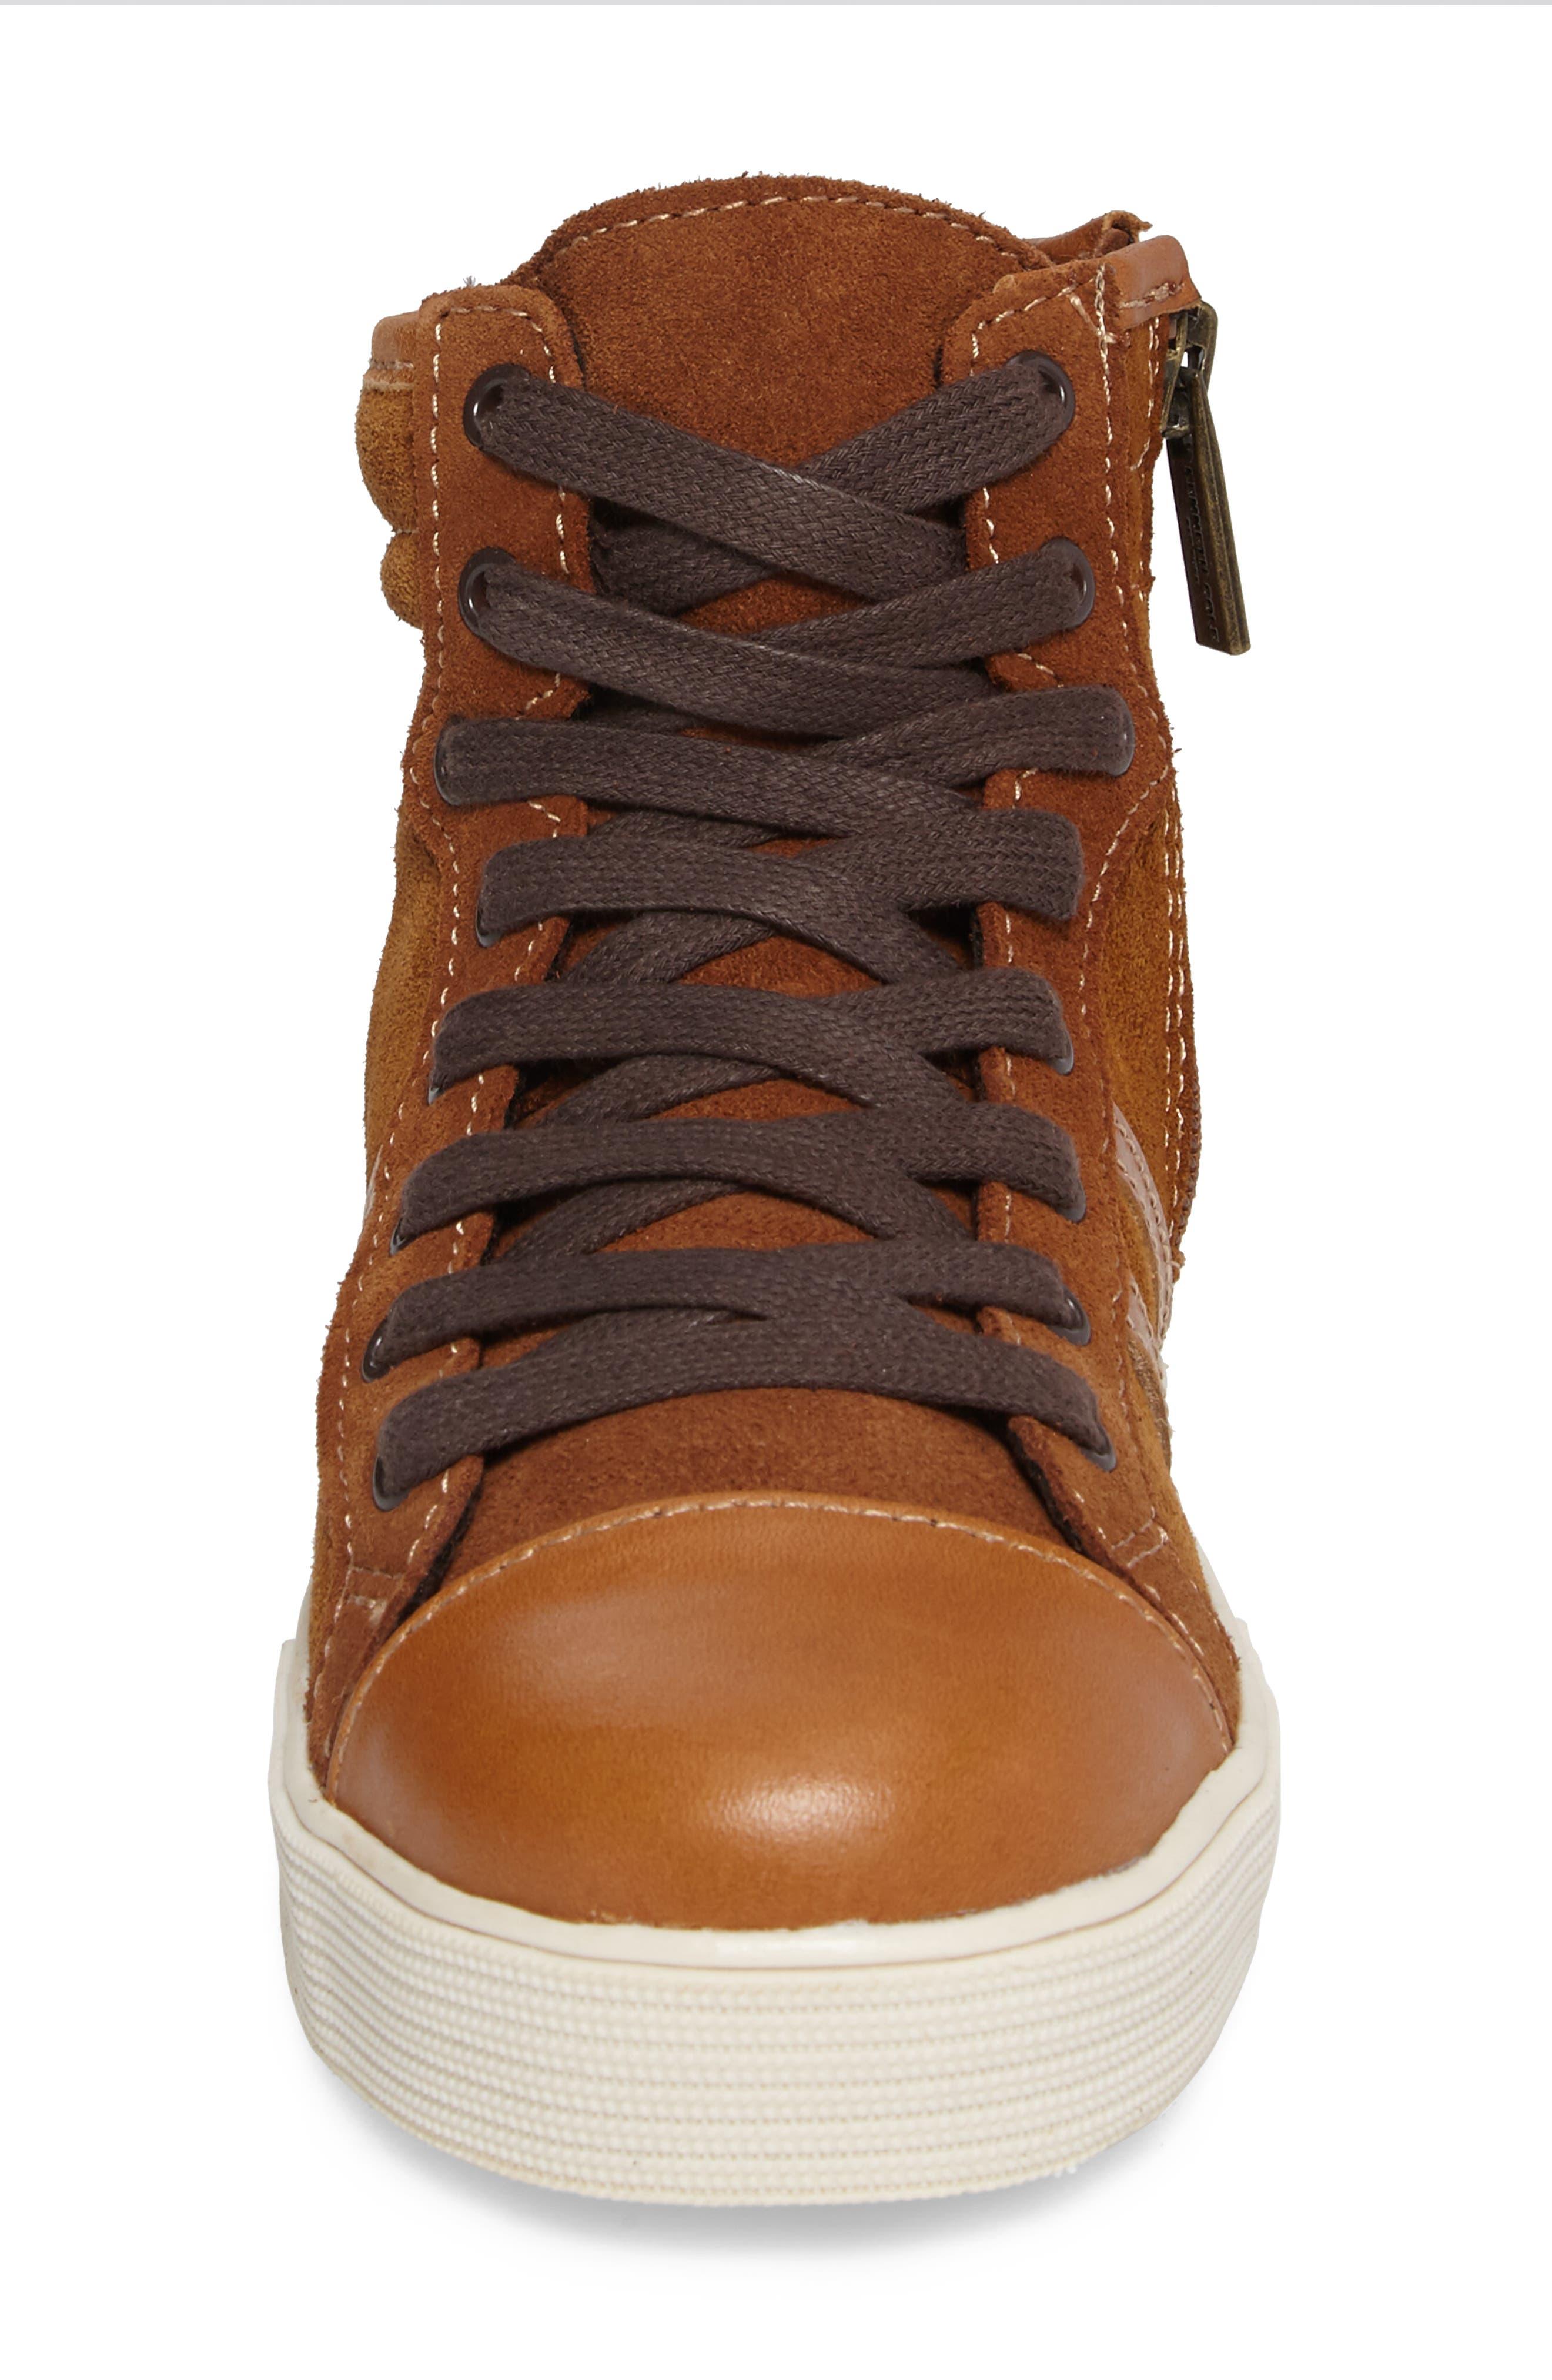 Jay Top High-Top Zip Sneaker,                             Alternate thumbnail 4, color,                             205